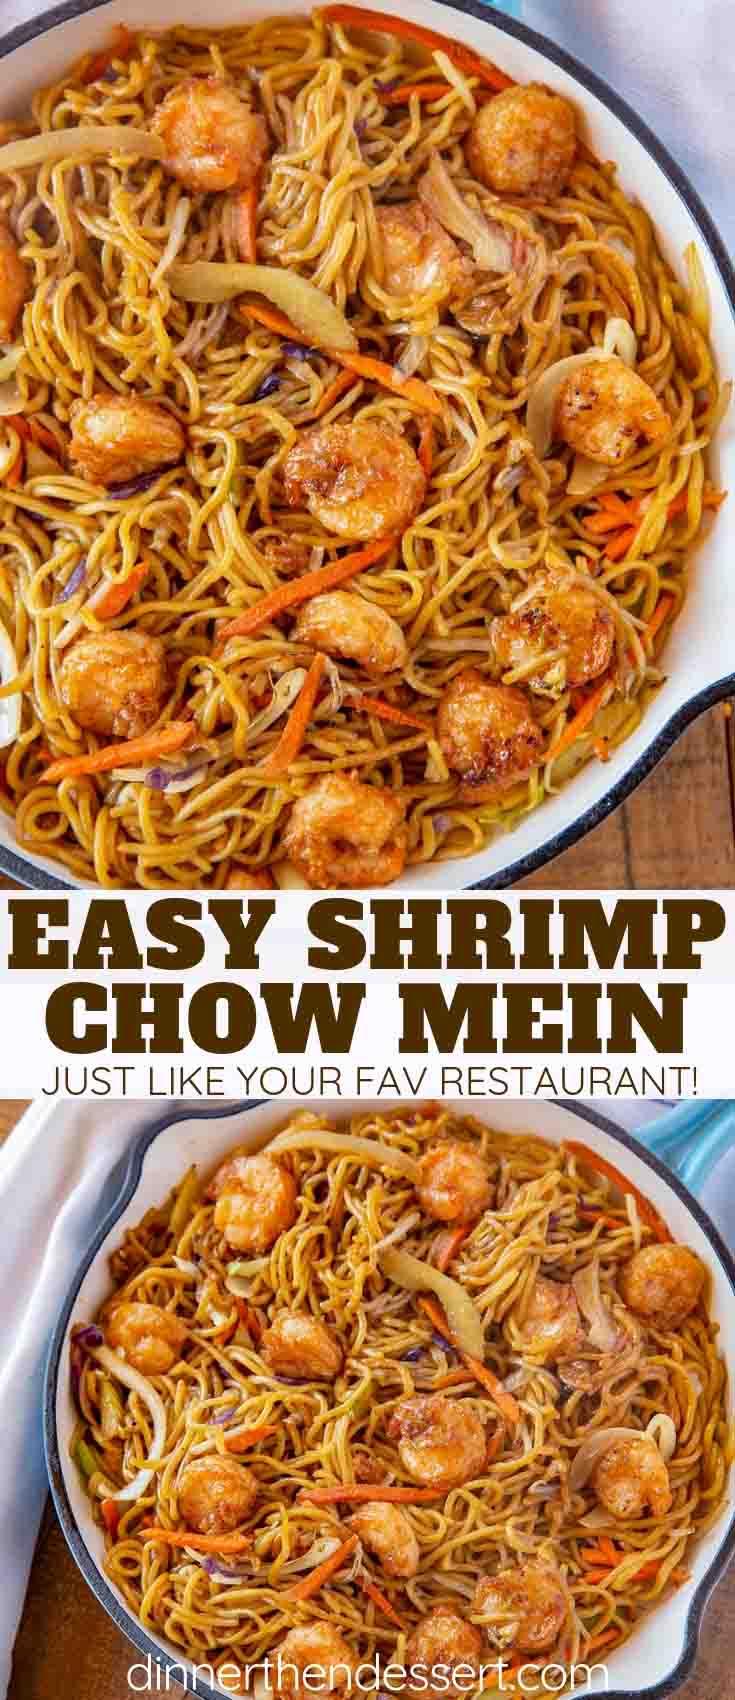 Shrimp Chow Mein Dinner Then Dessert